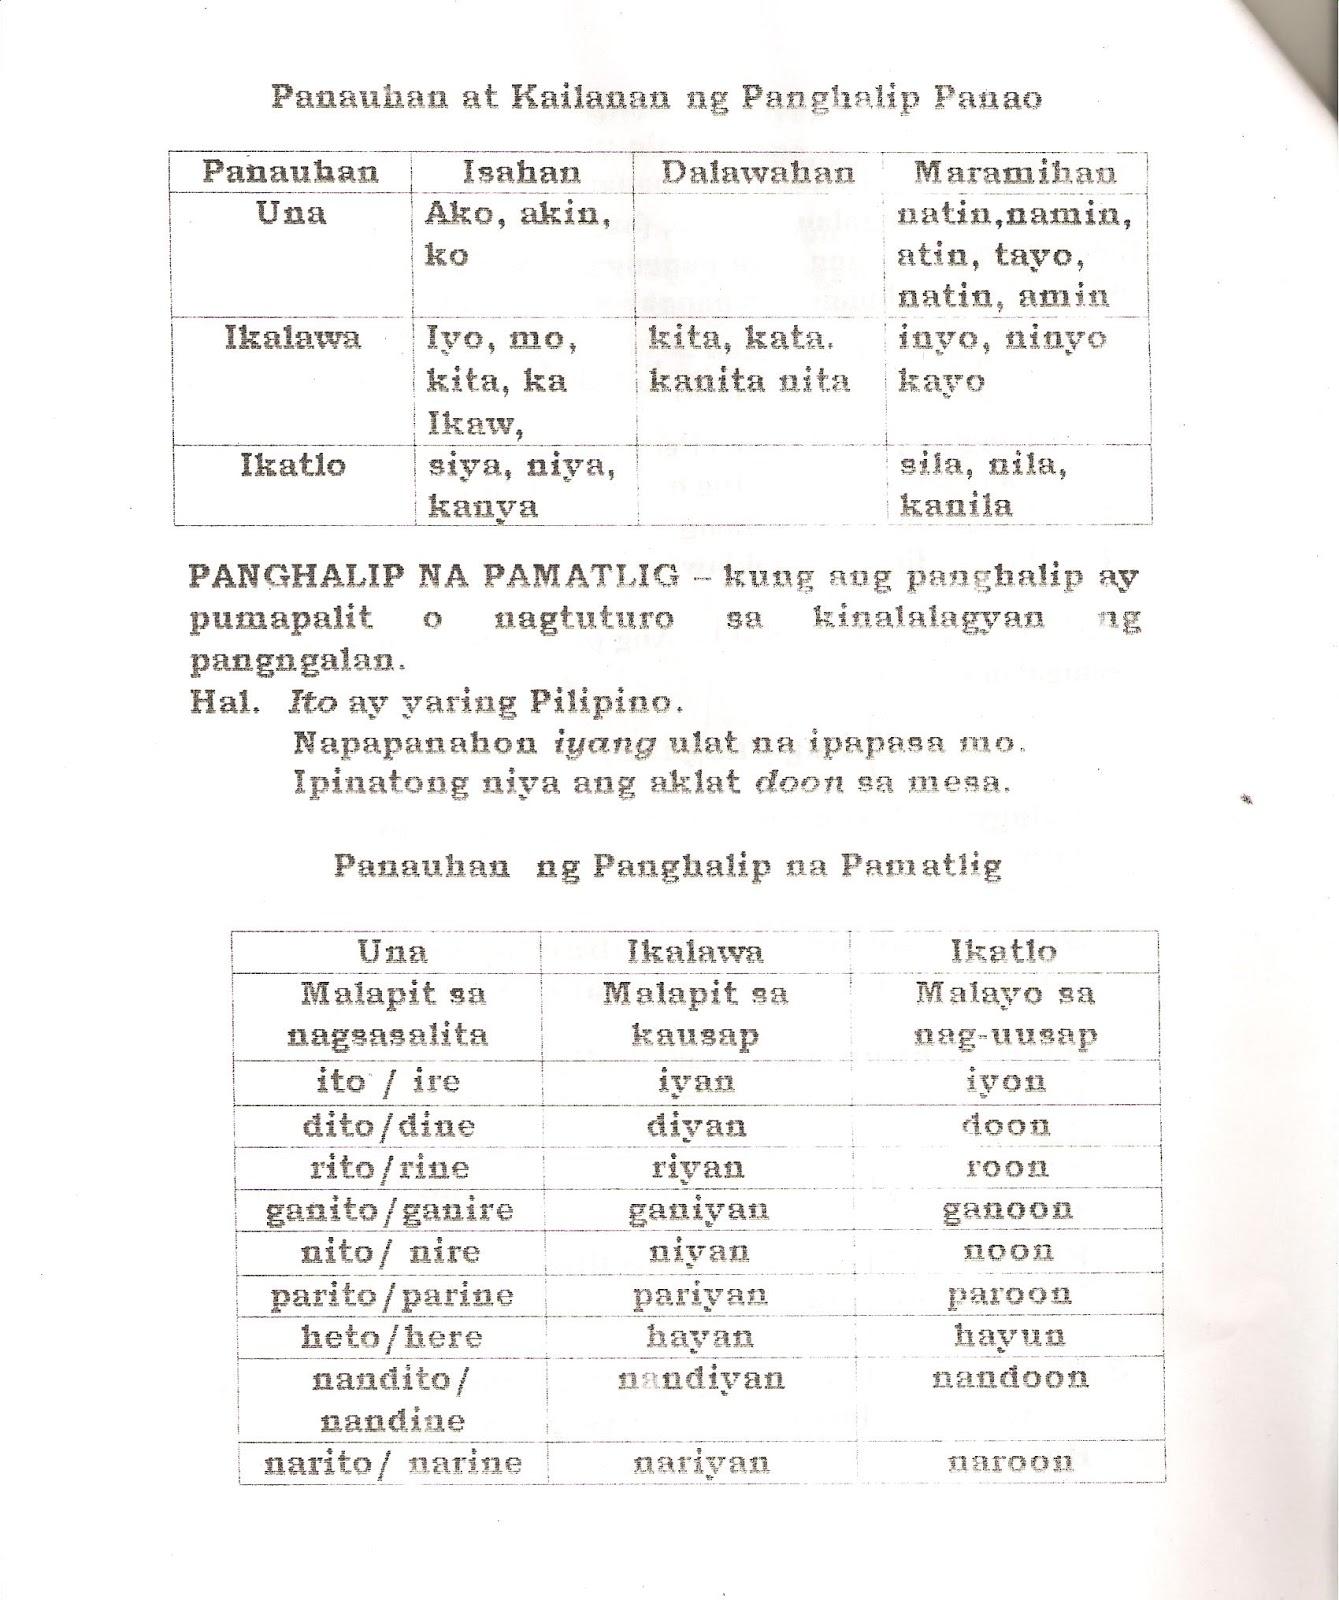 hight resolution of Pang Abay O Pang Uri Worksheet   Printable Worksheets and Activities for  Teachers